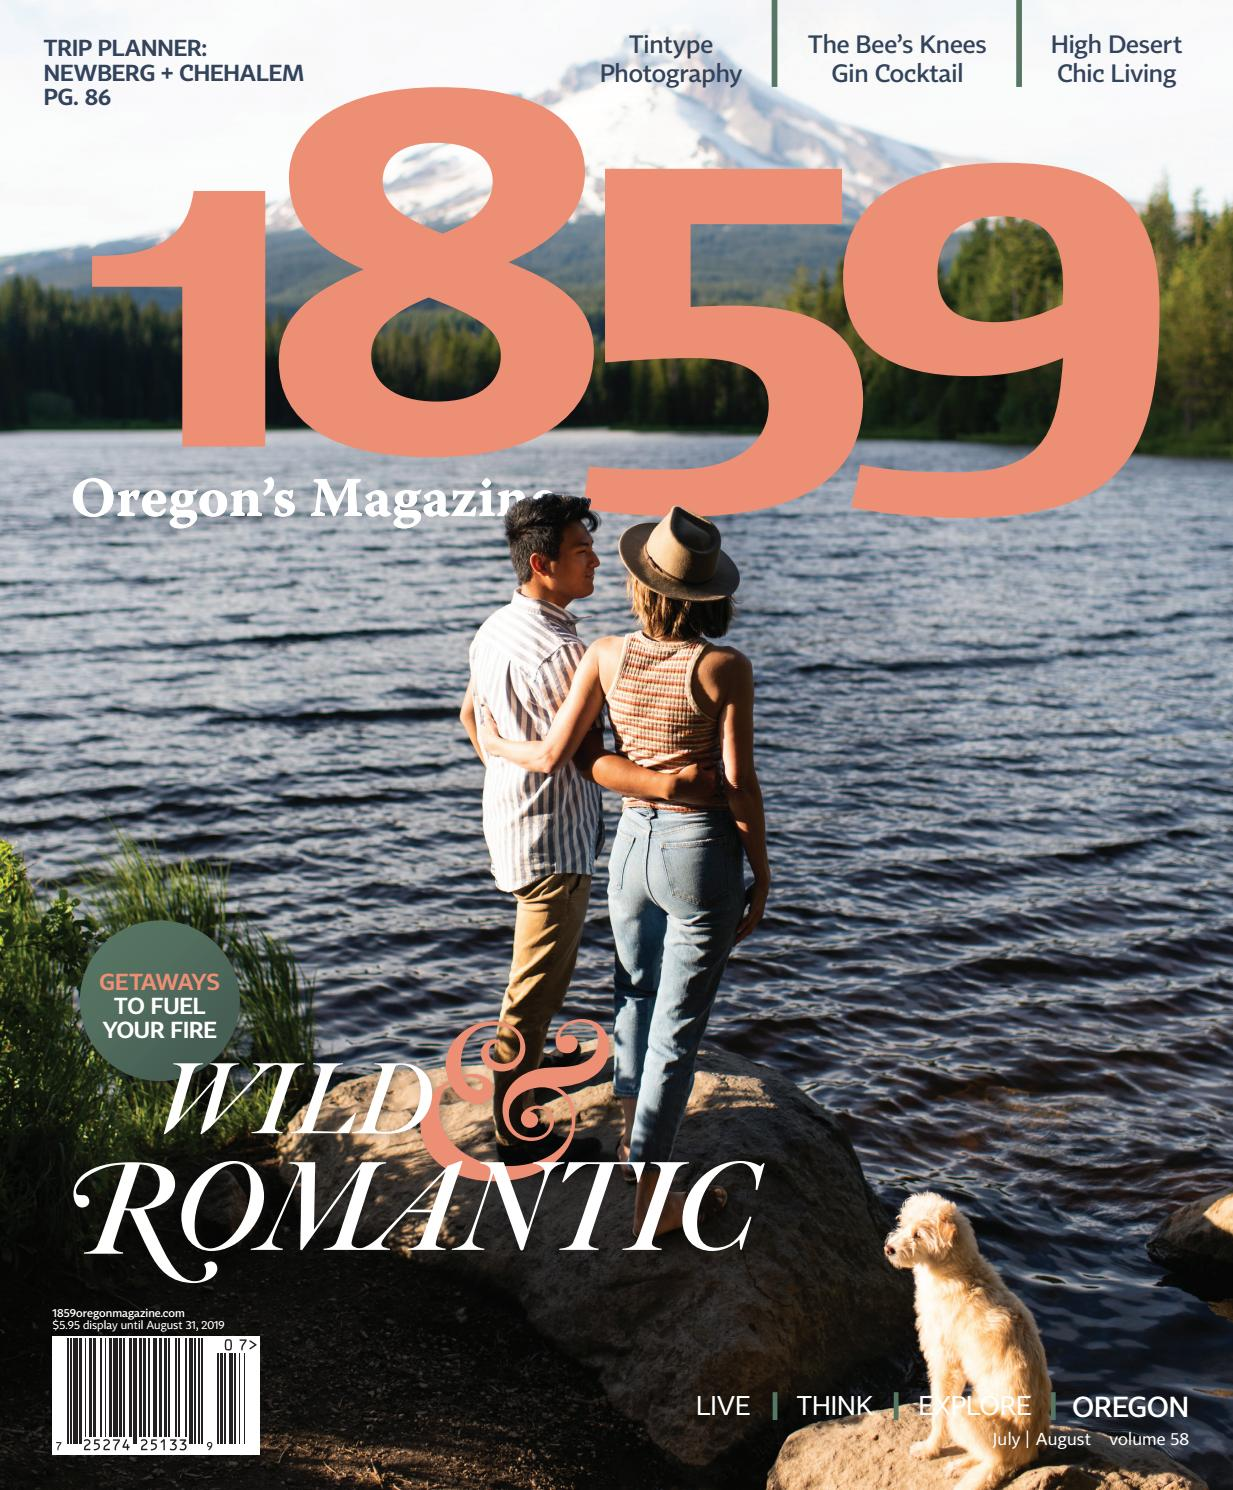 1859 Oregon's Magazine | July/August 2019 by Statehood Media